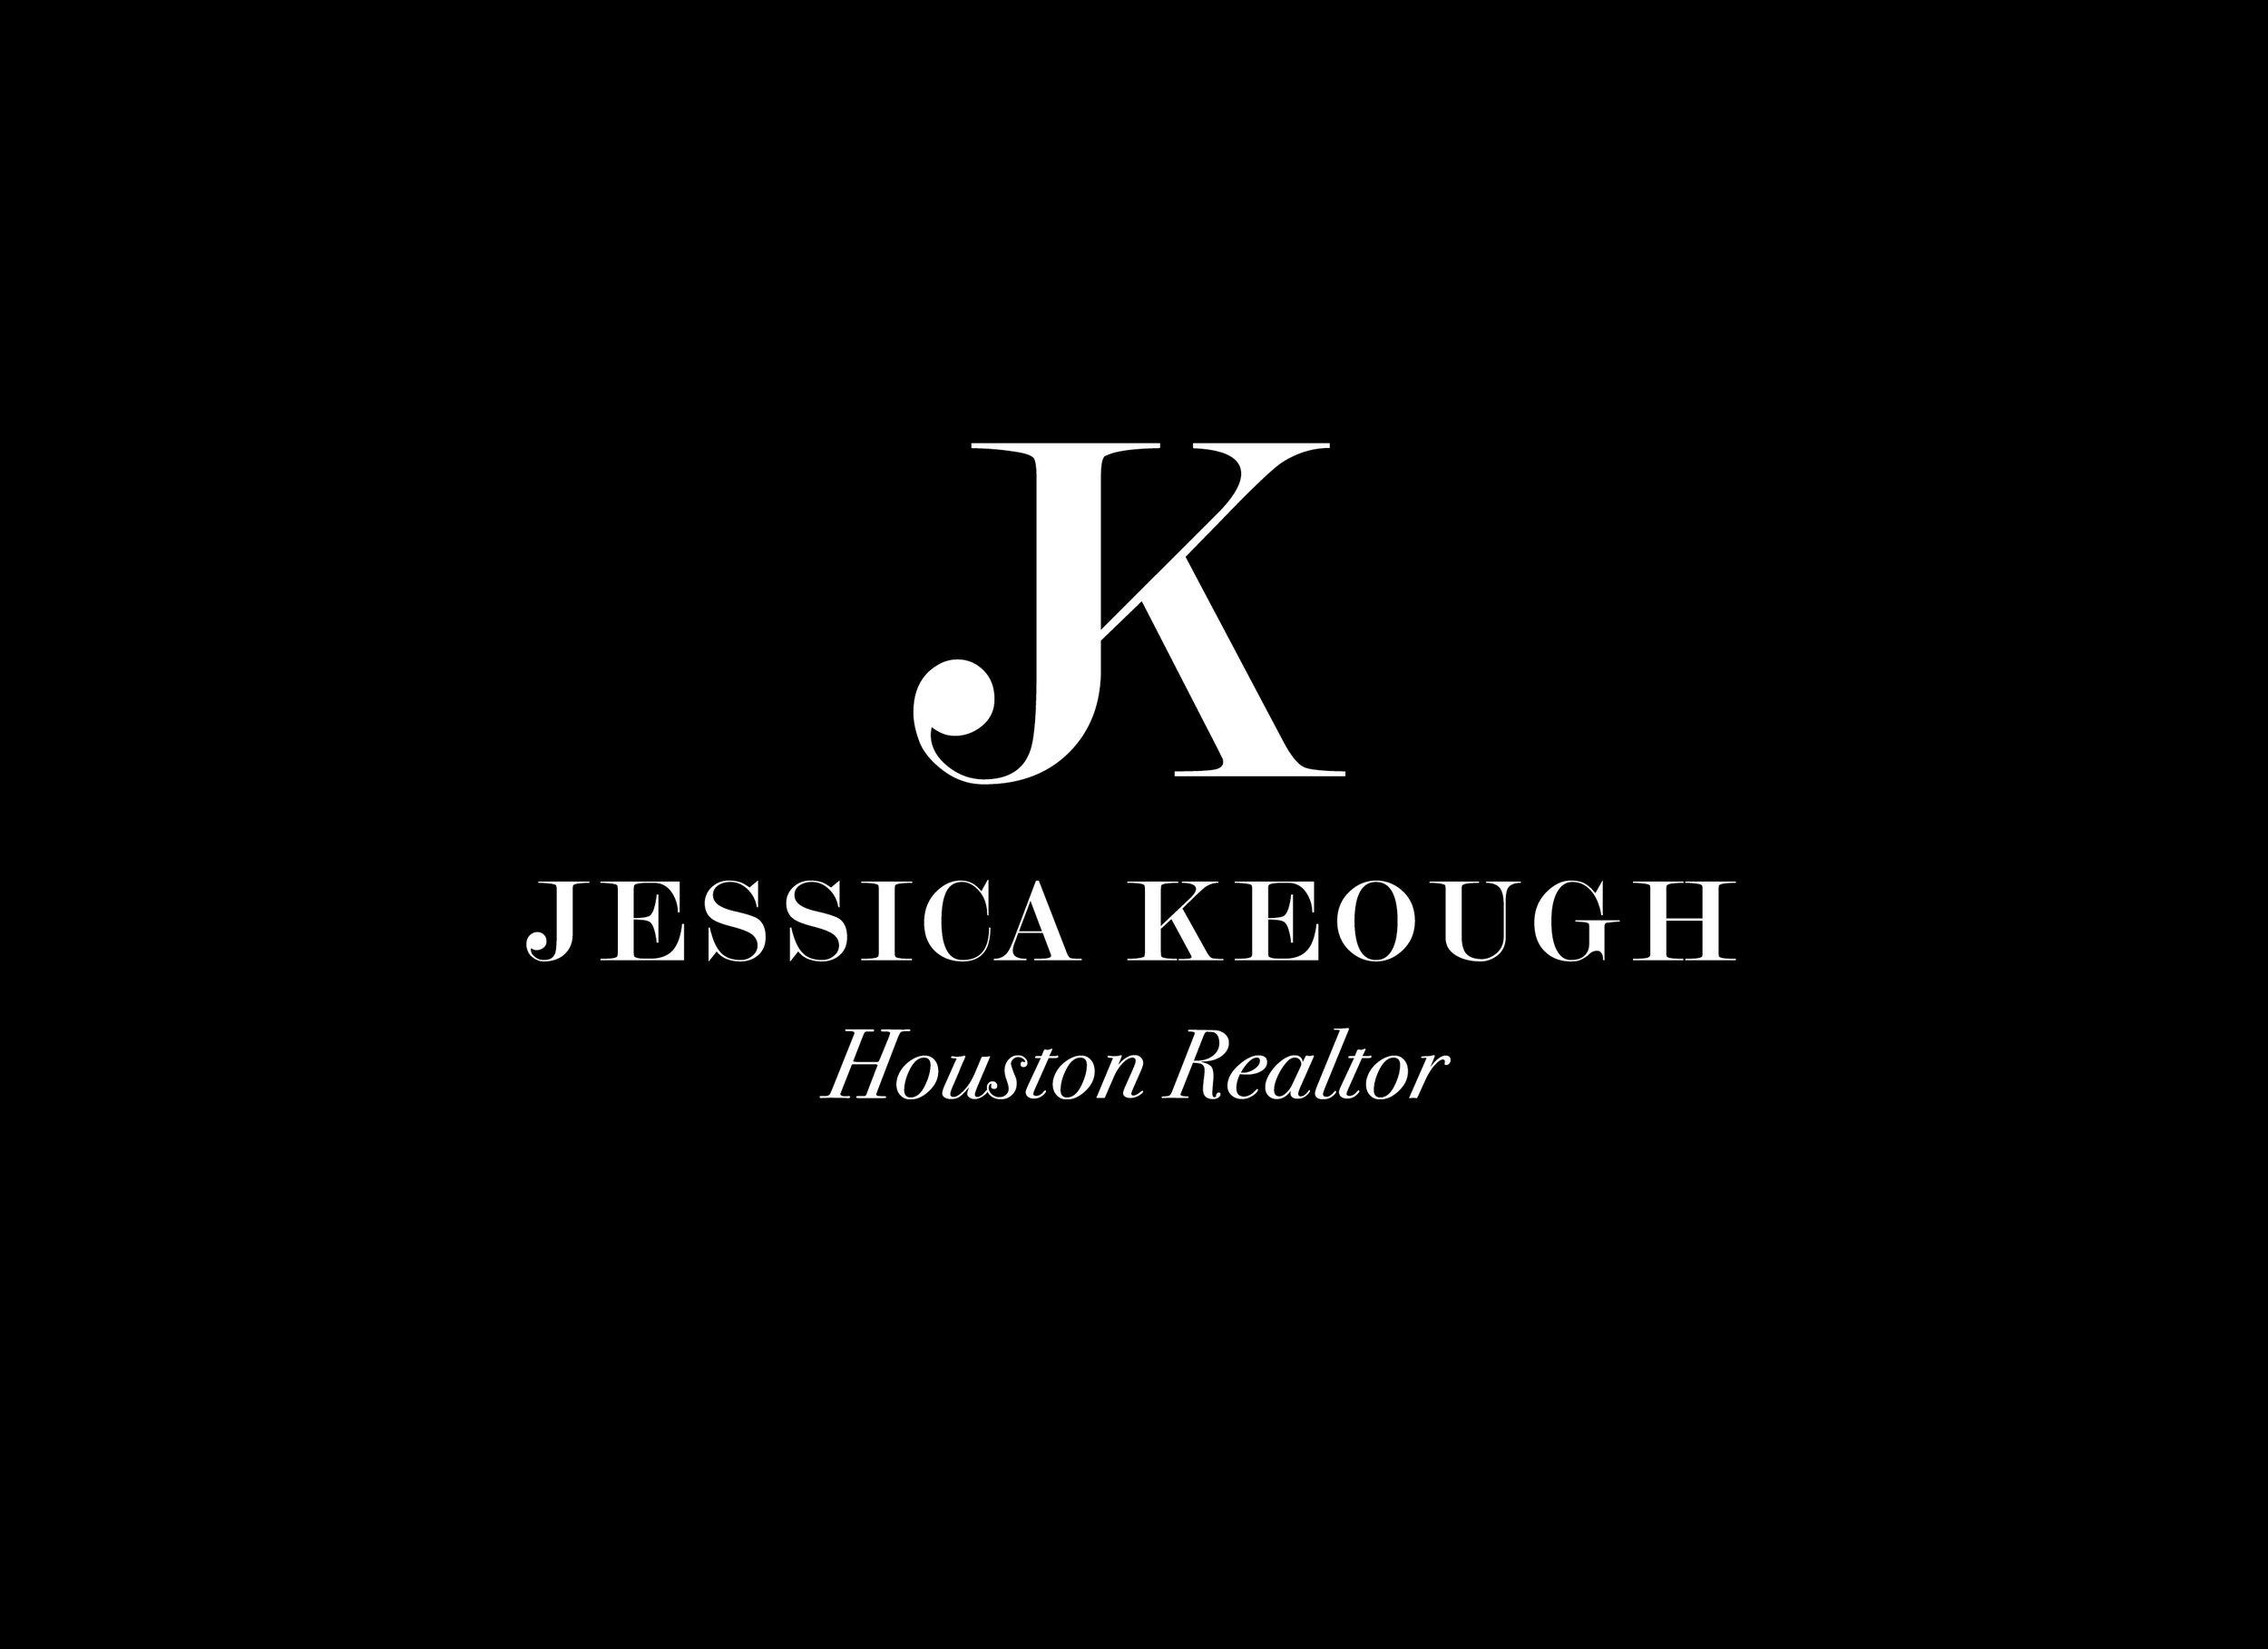 jessica-keough-houston-realtor-logo